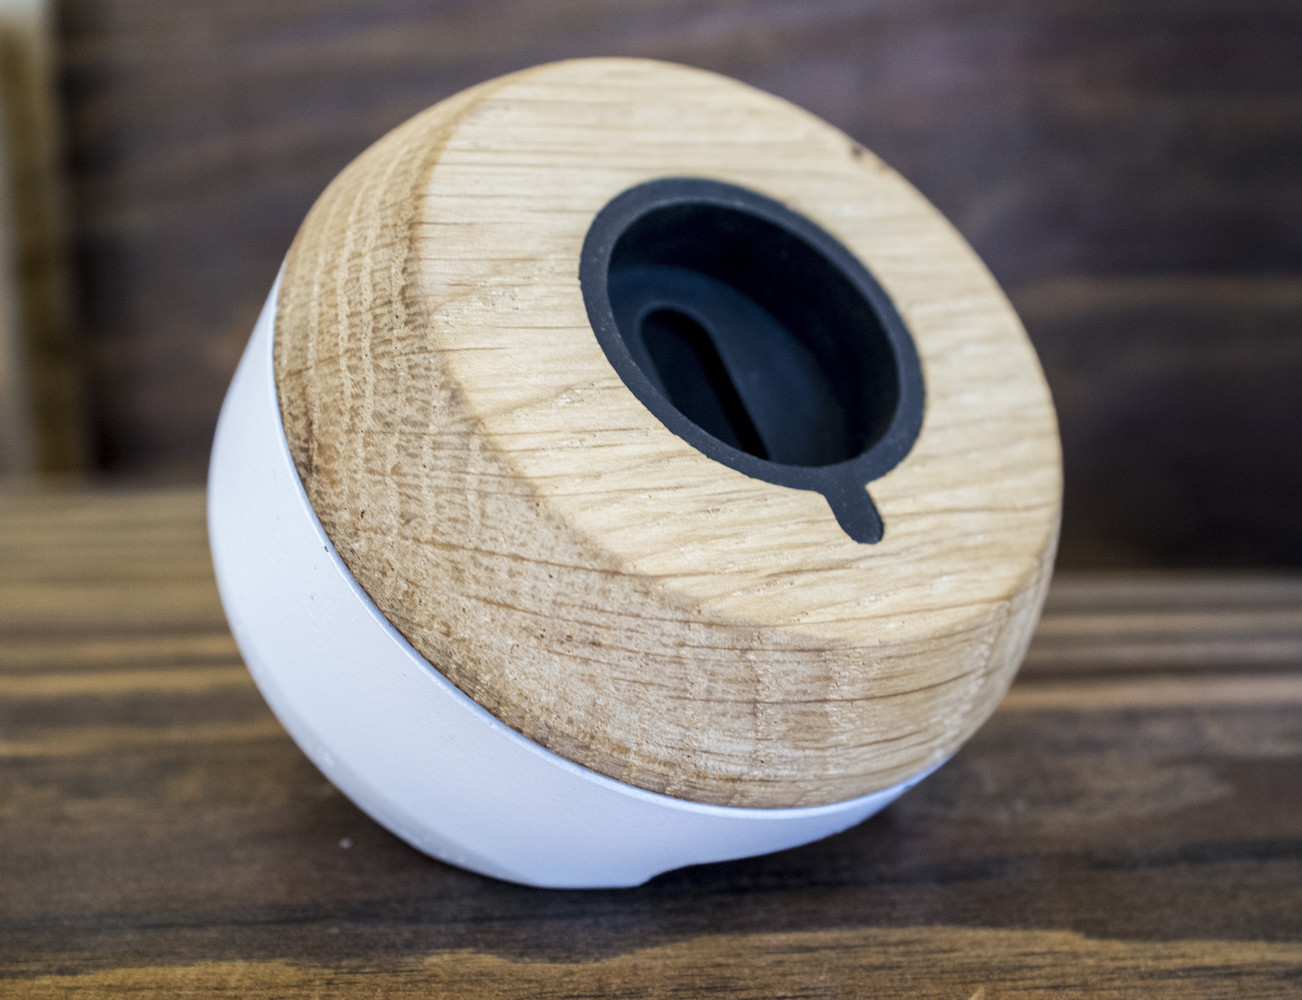 chestnut-smartwatch-dock-from-enveo-03